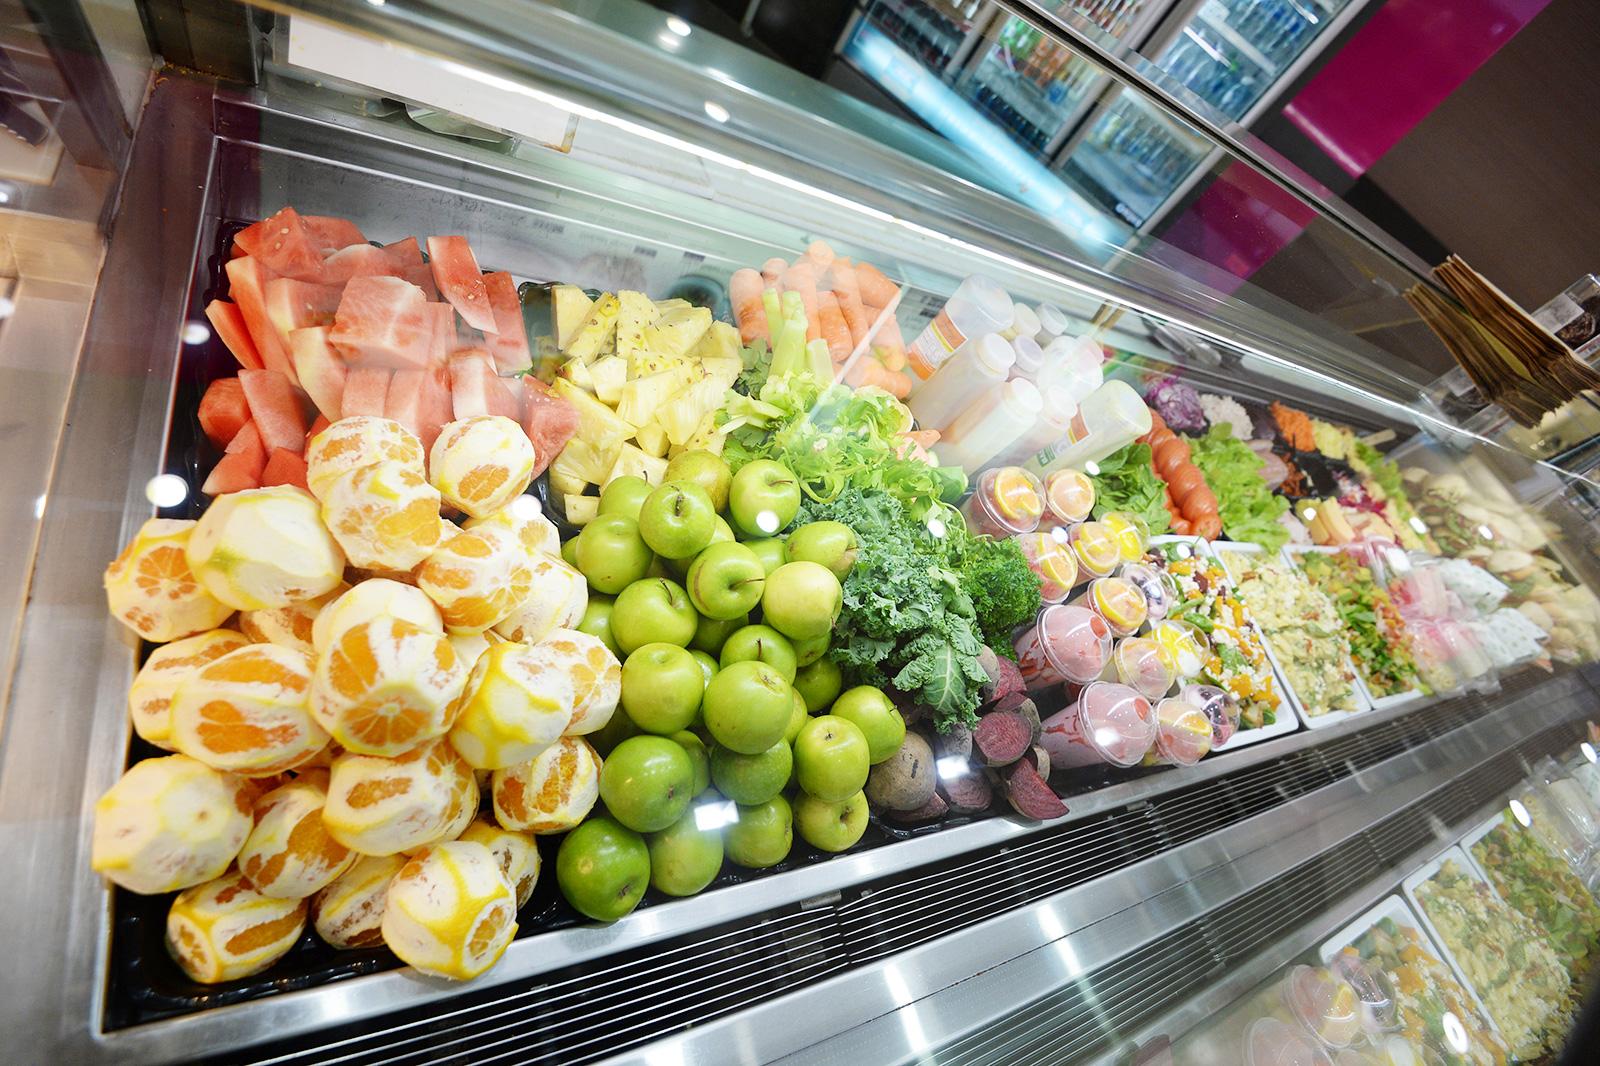 takeaway-sandwich-shop-healthy-habits-grafton-shopping-world-reduced-price-3